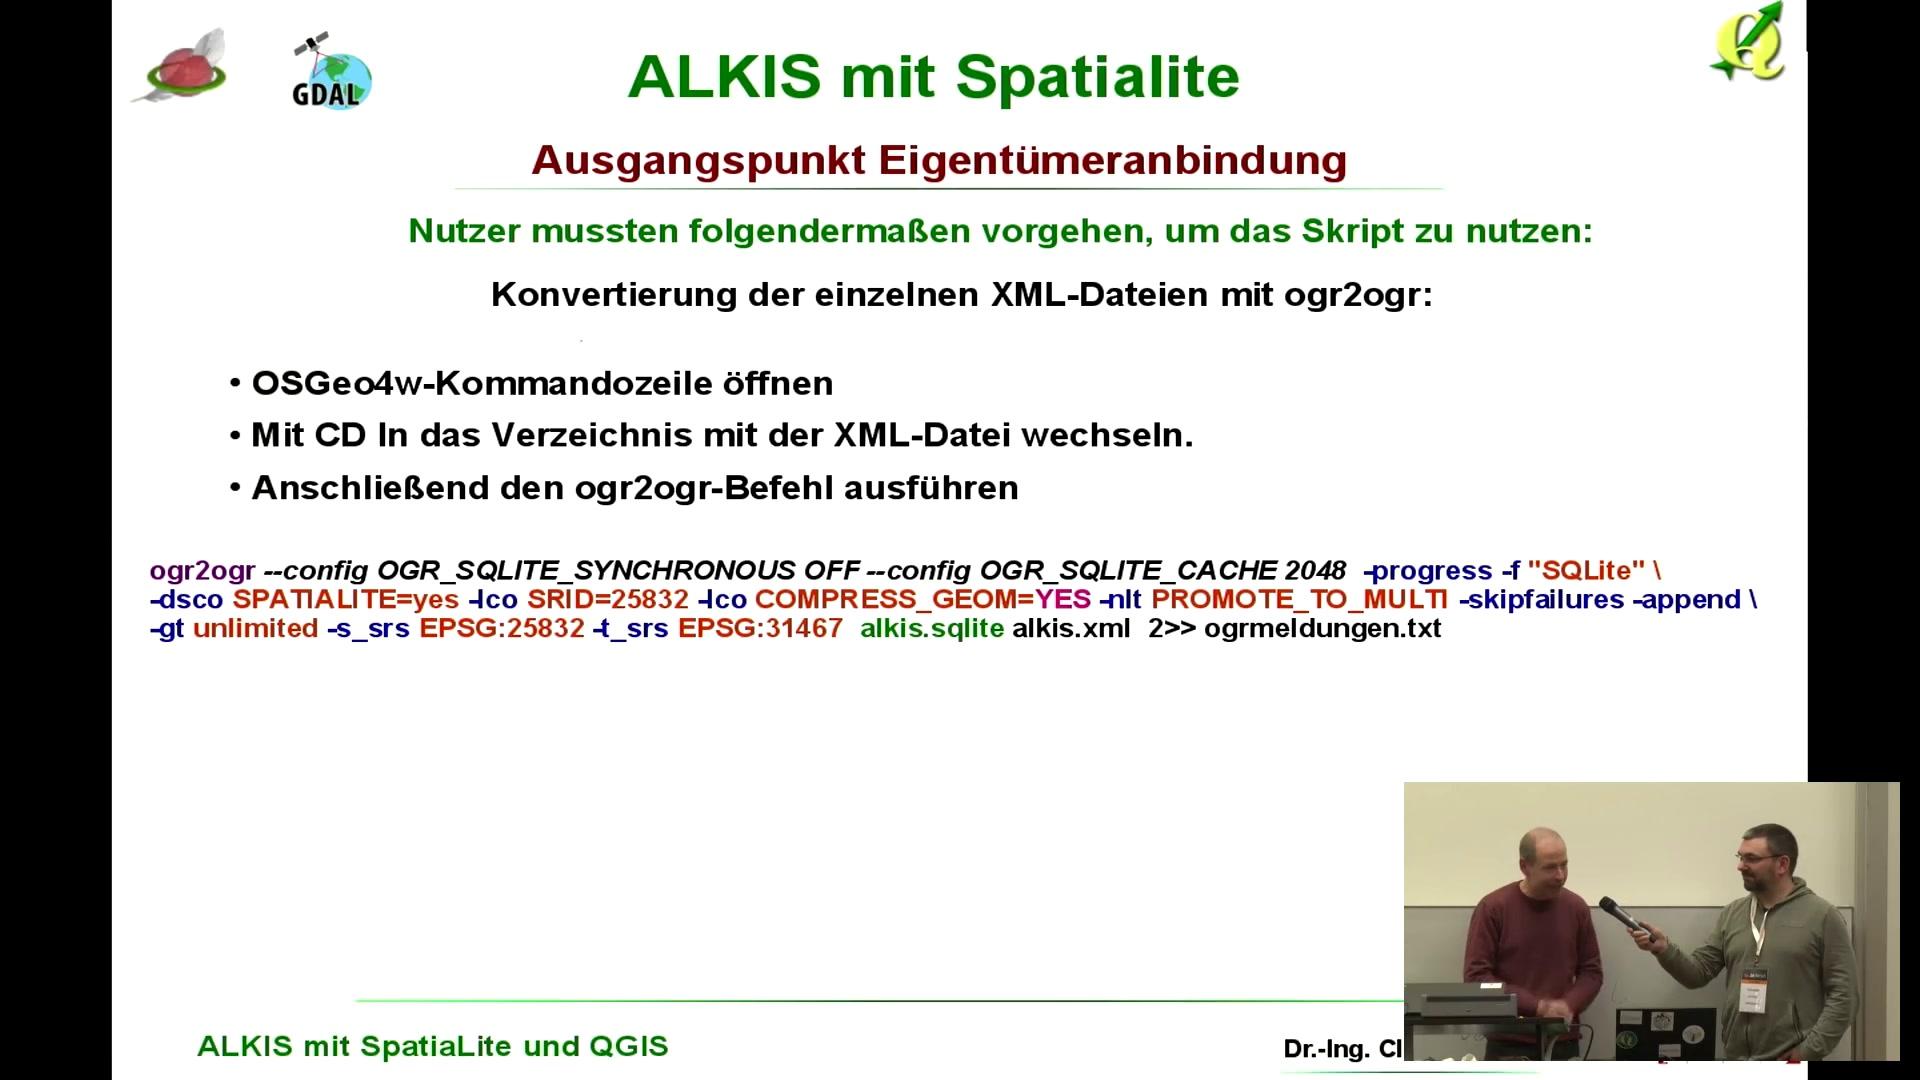 media ccc de - ALKIS kompakt mit SpatiaLite